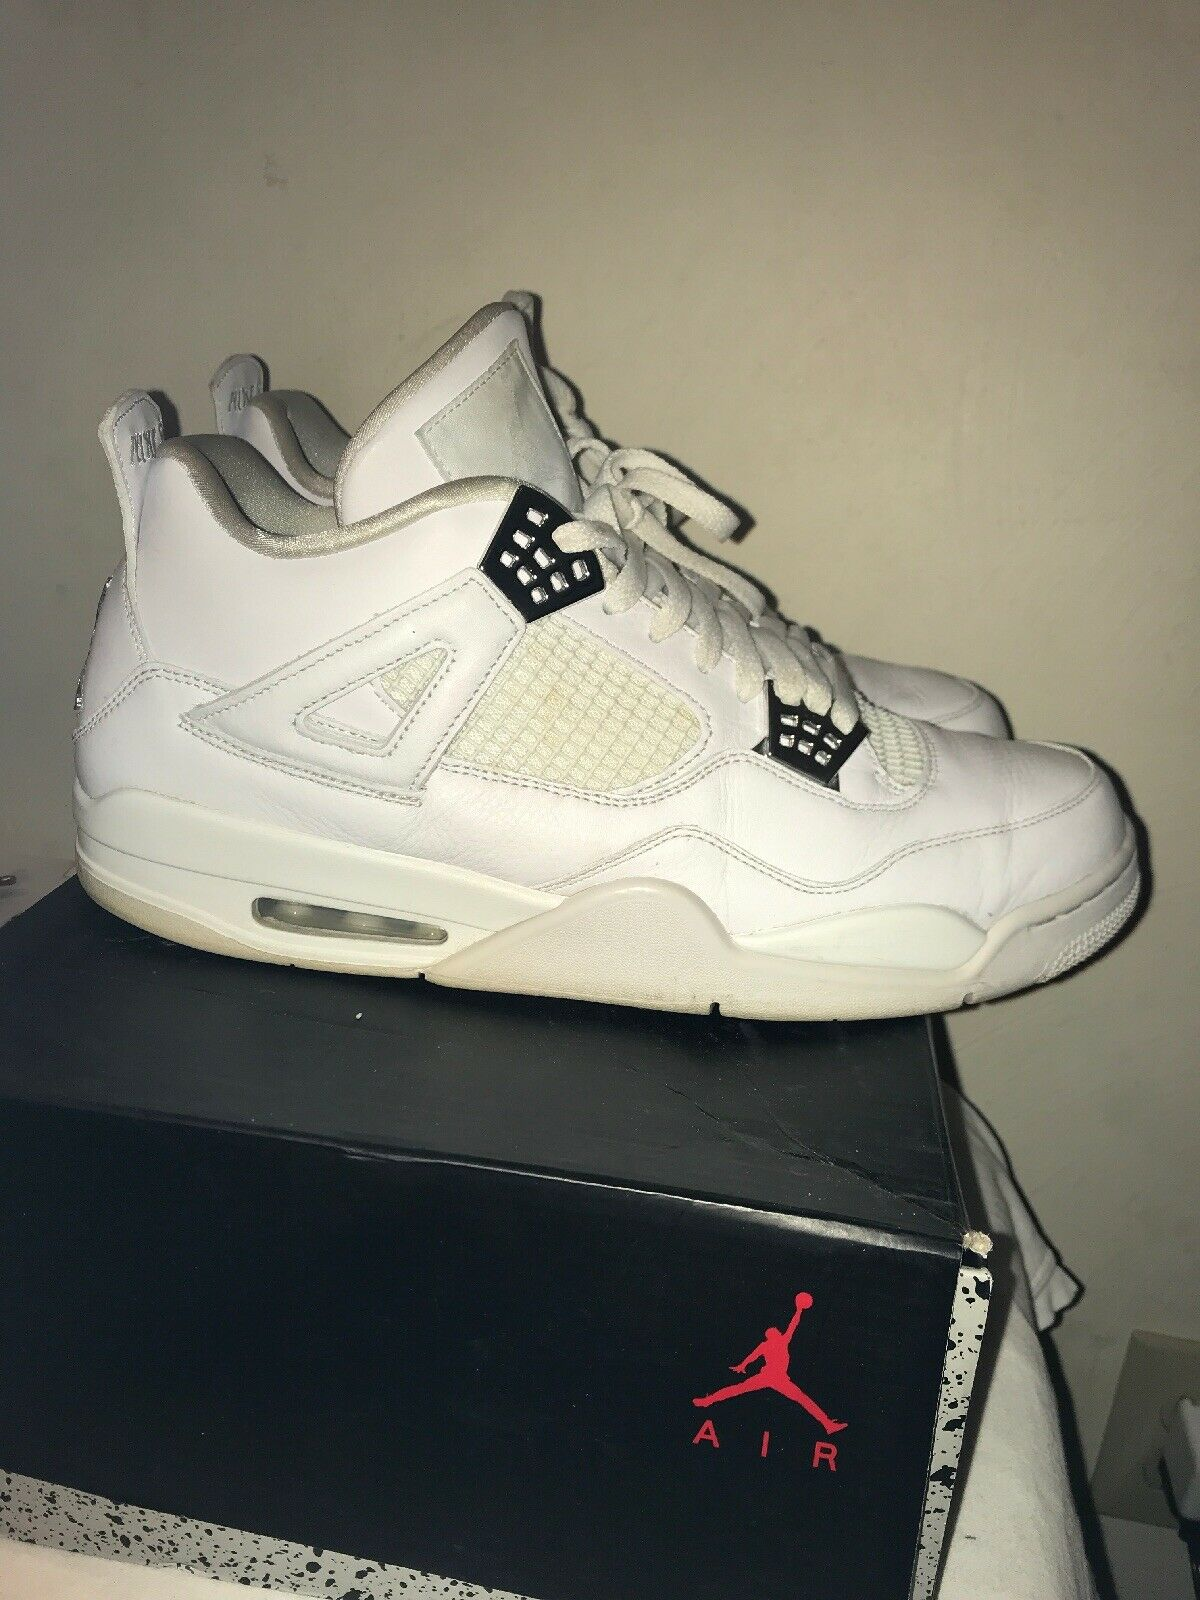 Nike Air Jordan 4 IV Retro Pure Money All White Silver 308497-100 Size 13